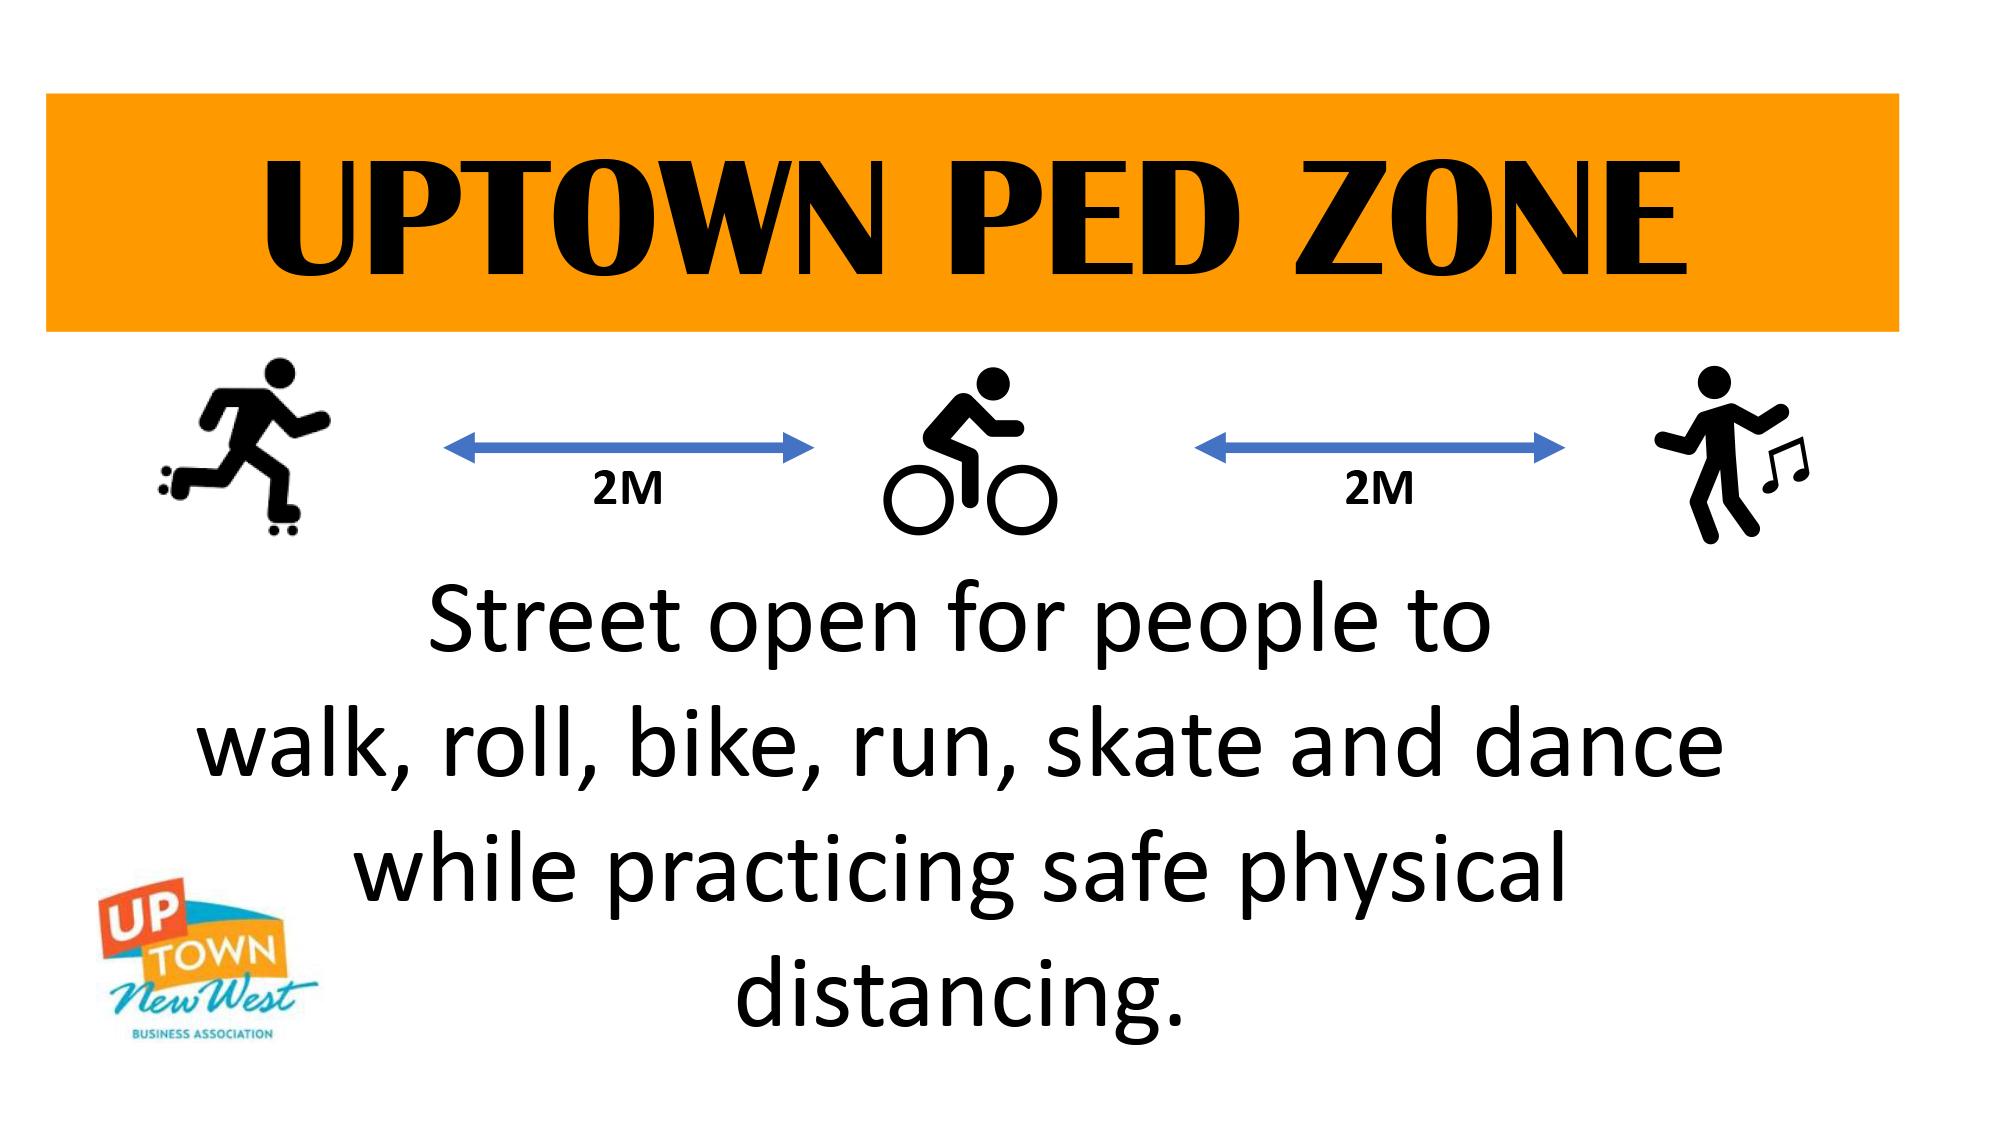 Uptown Ped Zone